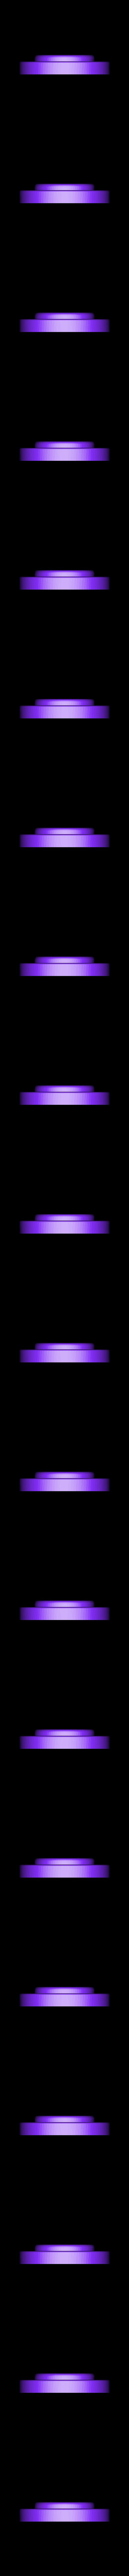 potentiometer_knob_2.stl Download free STL file ORCA communicator (Godzilla) • 3D printing object, poblocki1982